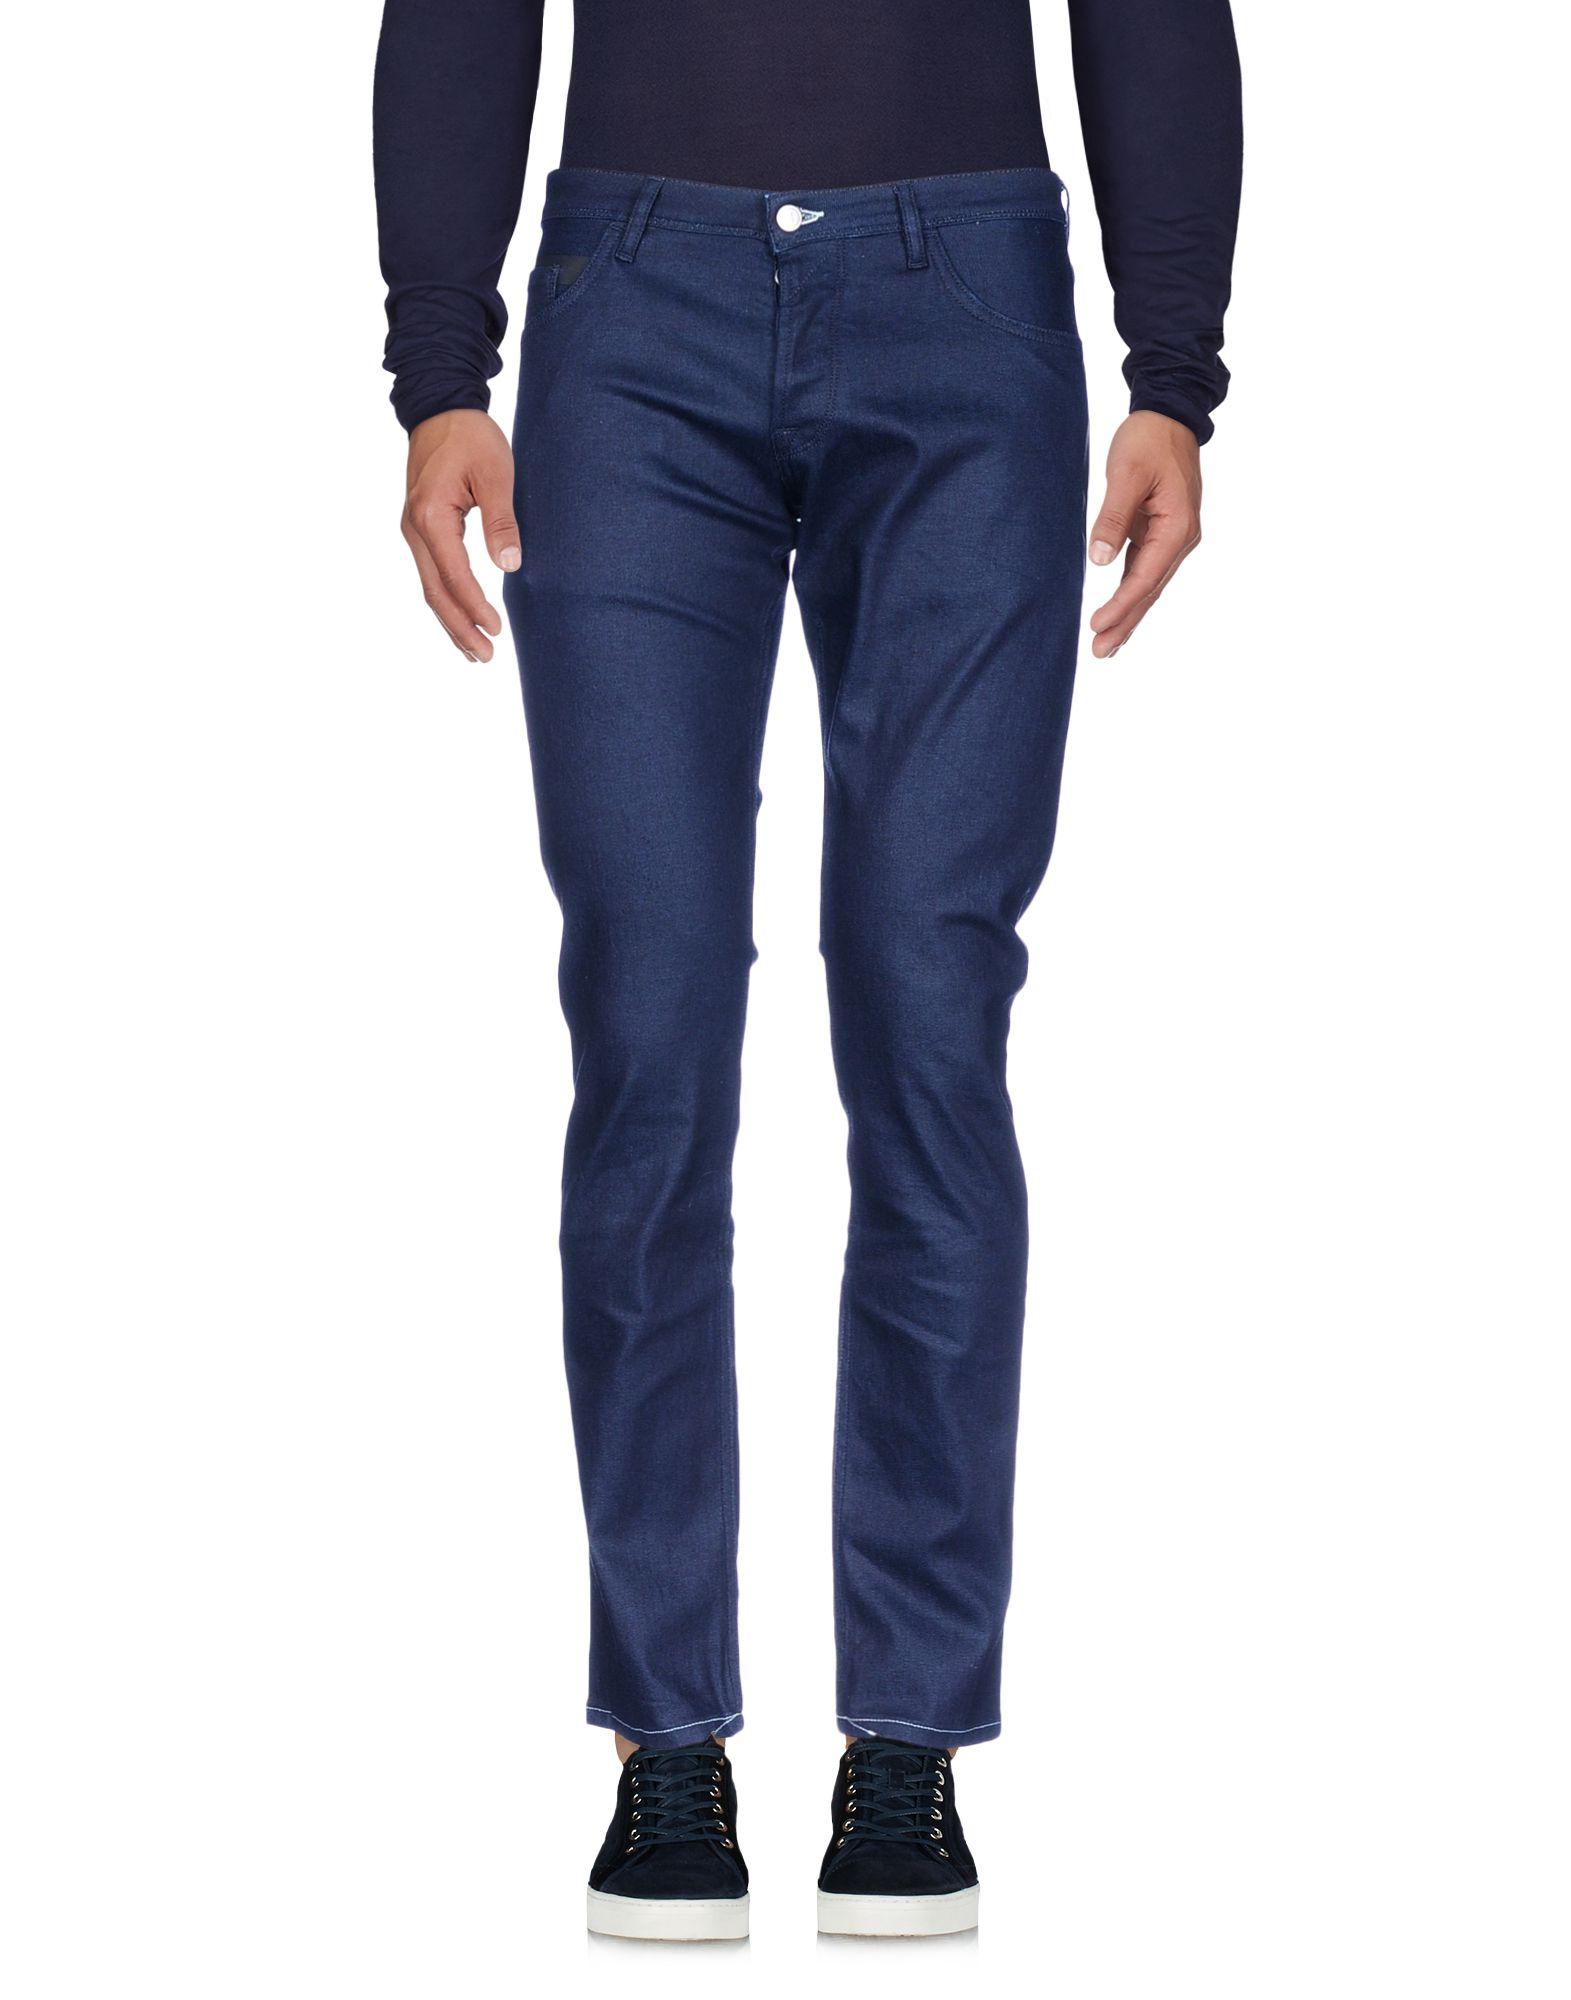 PATRIZIA PEPE Джинсовые брюки patrizia pepe джинсы из денима стрейч